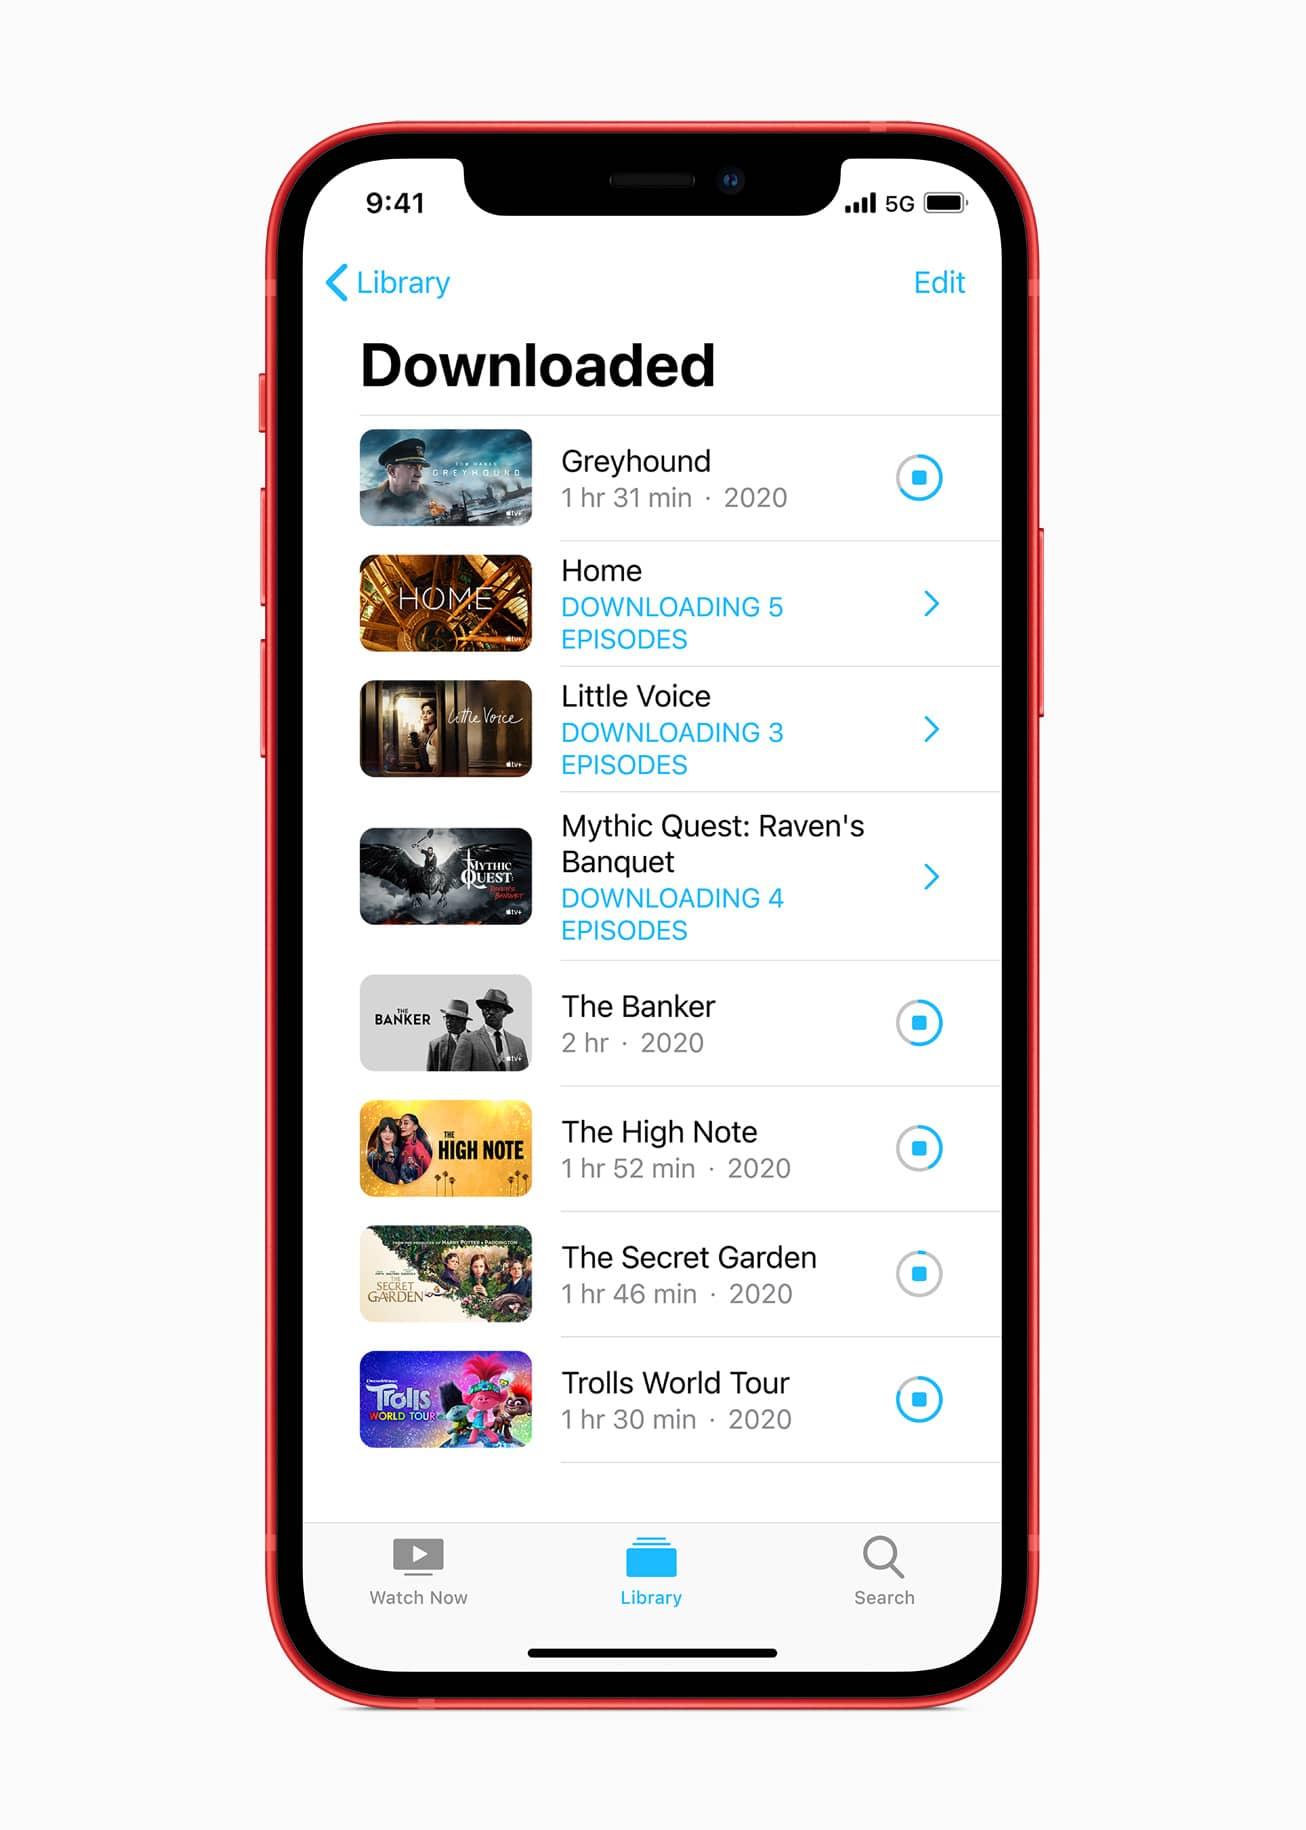 apple iphone 12 5g downloads 10132020